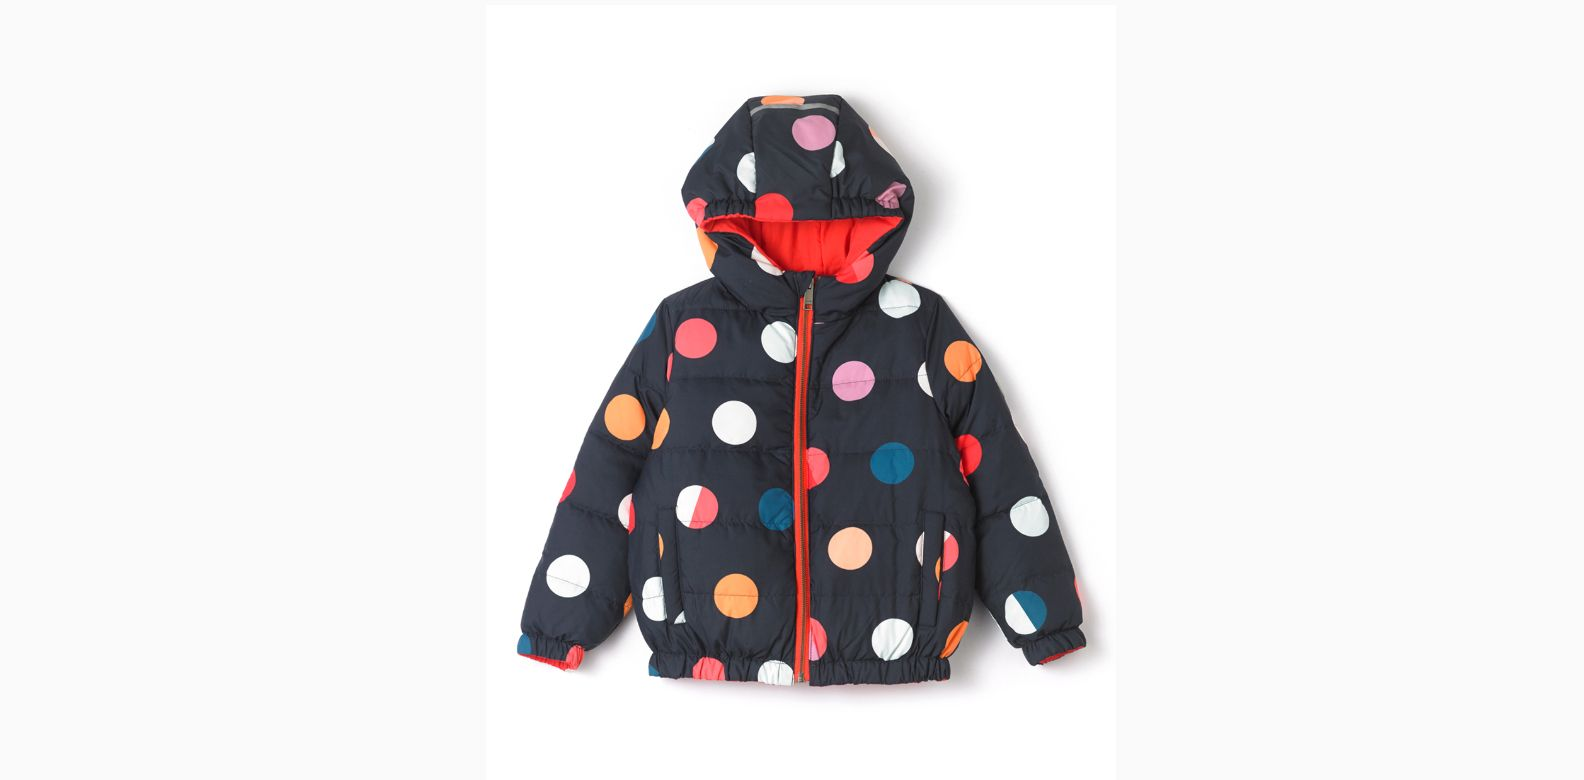 Paul Smith Junior jacket; B1-59 The Shoppes at Marina Bay Sands